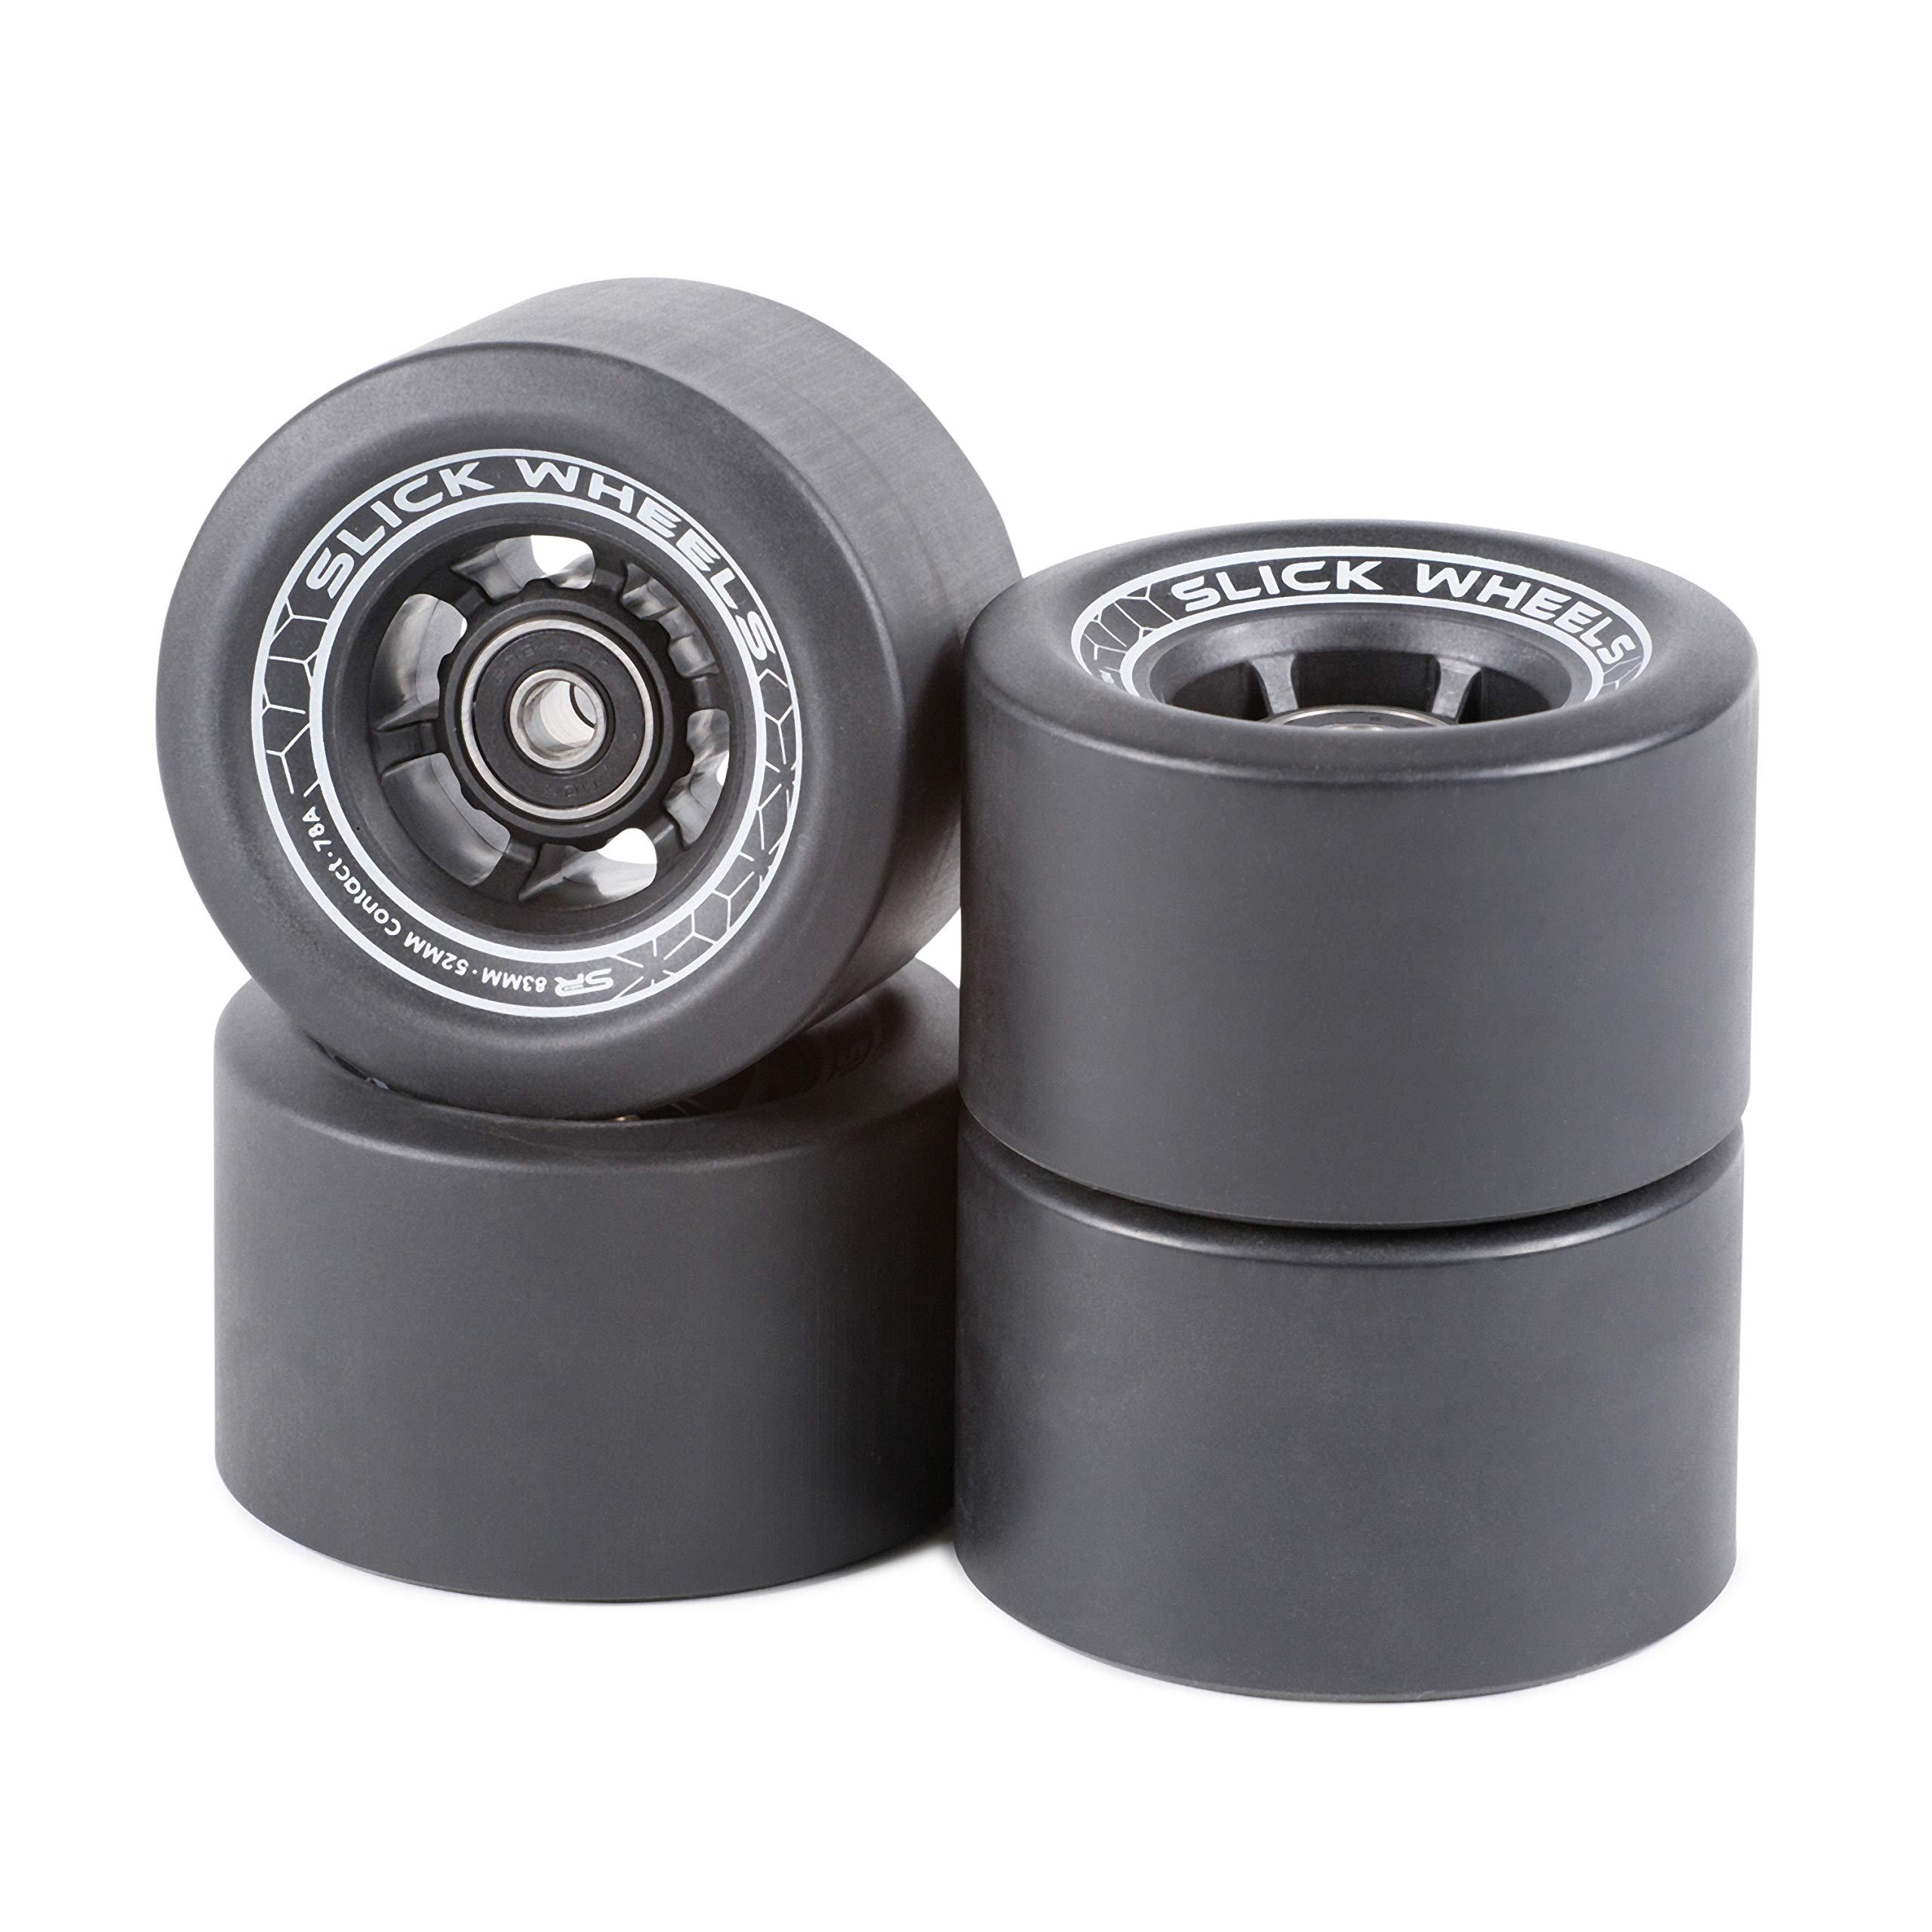 Slick Revolution Black Electric Skateboard and Longboard Wheels 78A (Black)